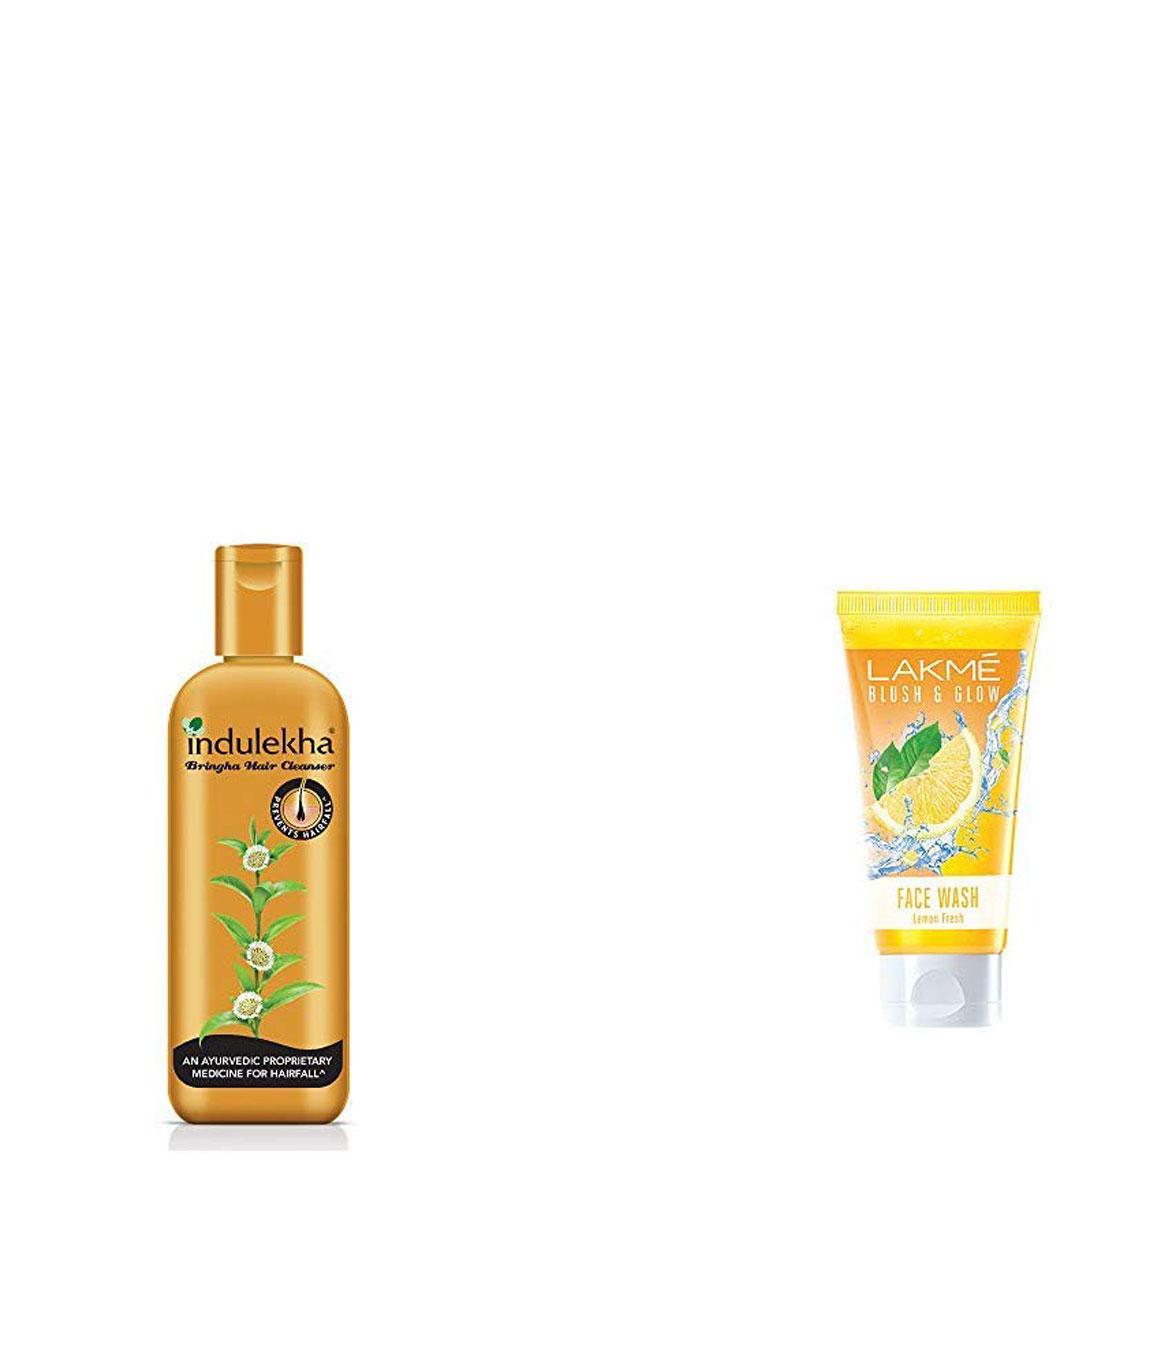 Indulekha Bringha Anti Hair Fall Shampoo, 200ml & Lakmé Blush and Glow Lemon Fresh Facewash, 100gm